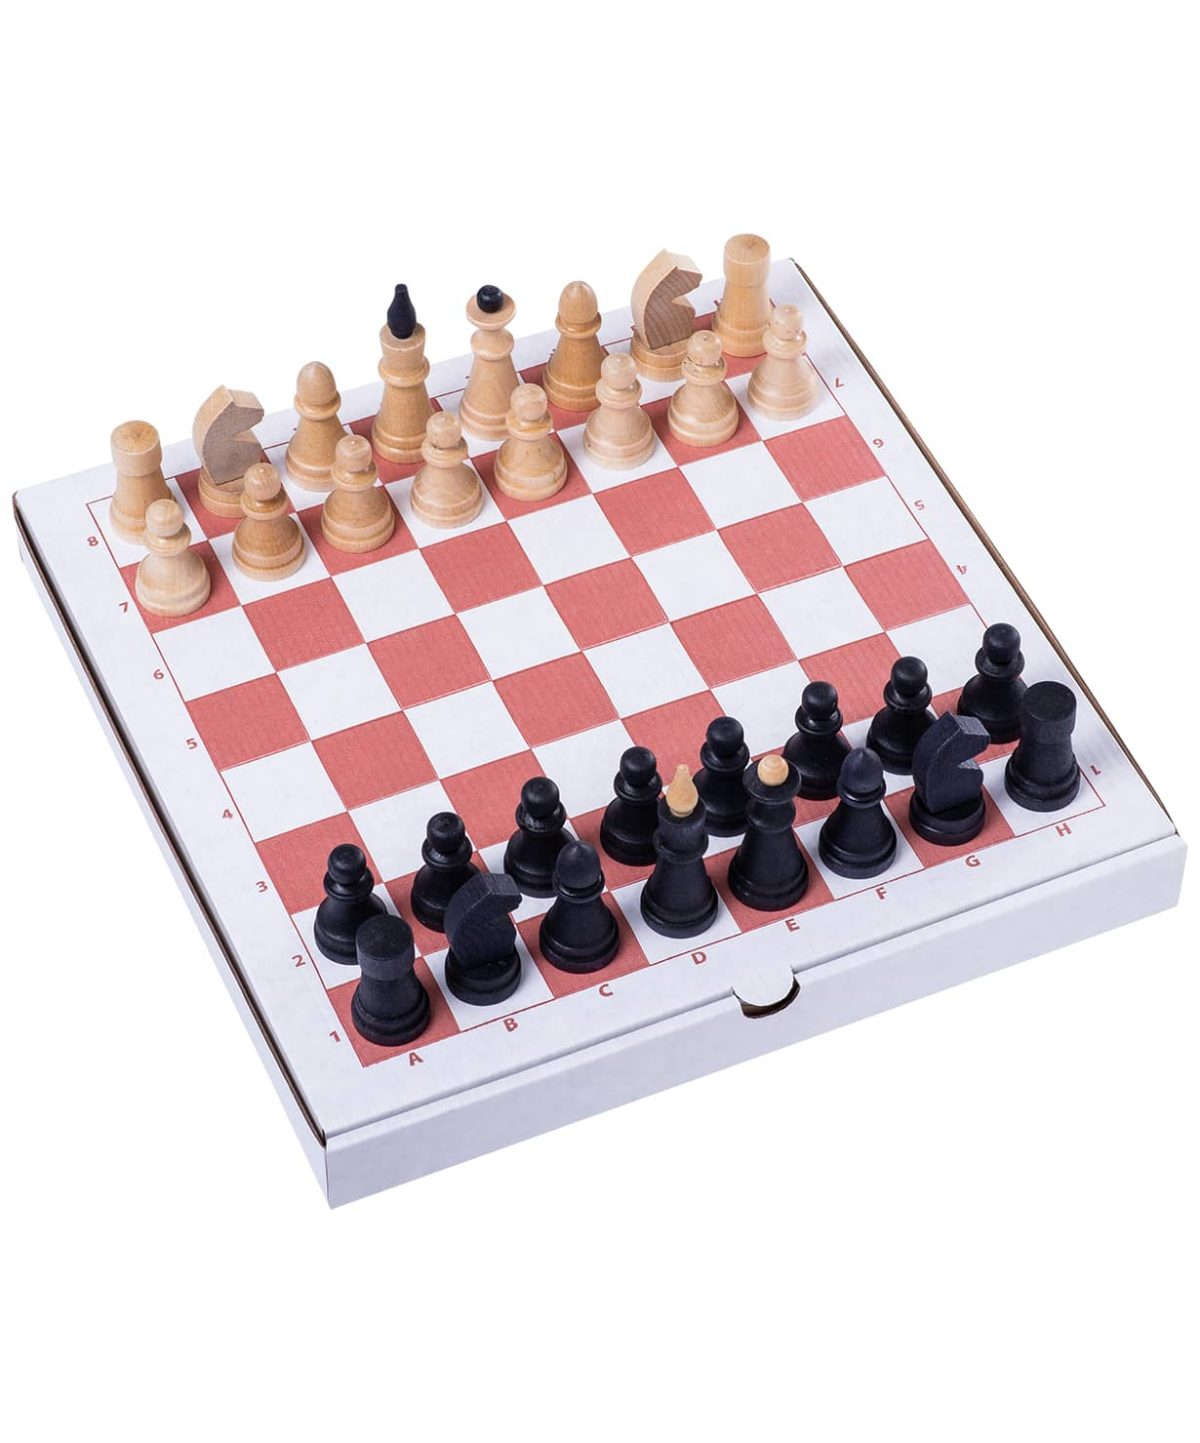 "ПРАЙМ СПОРТ Игра 3 в 1 ""Классика"" (шахматы, нарды, шашки)  458-20 - 2"